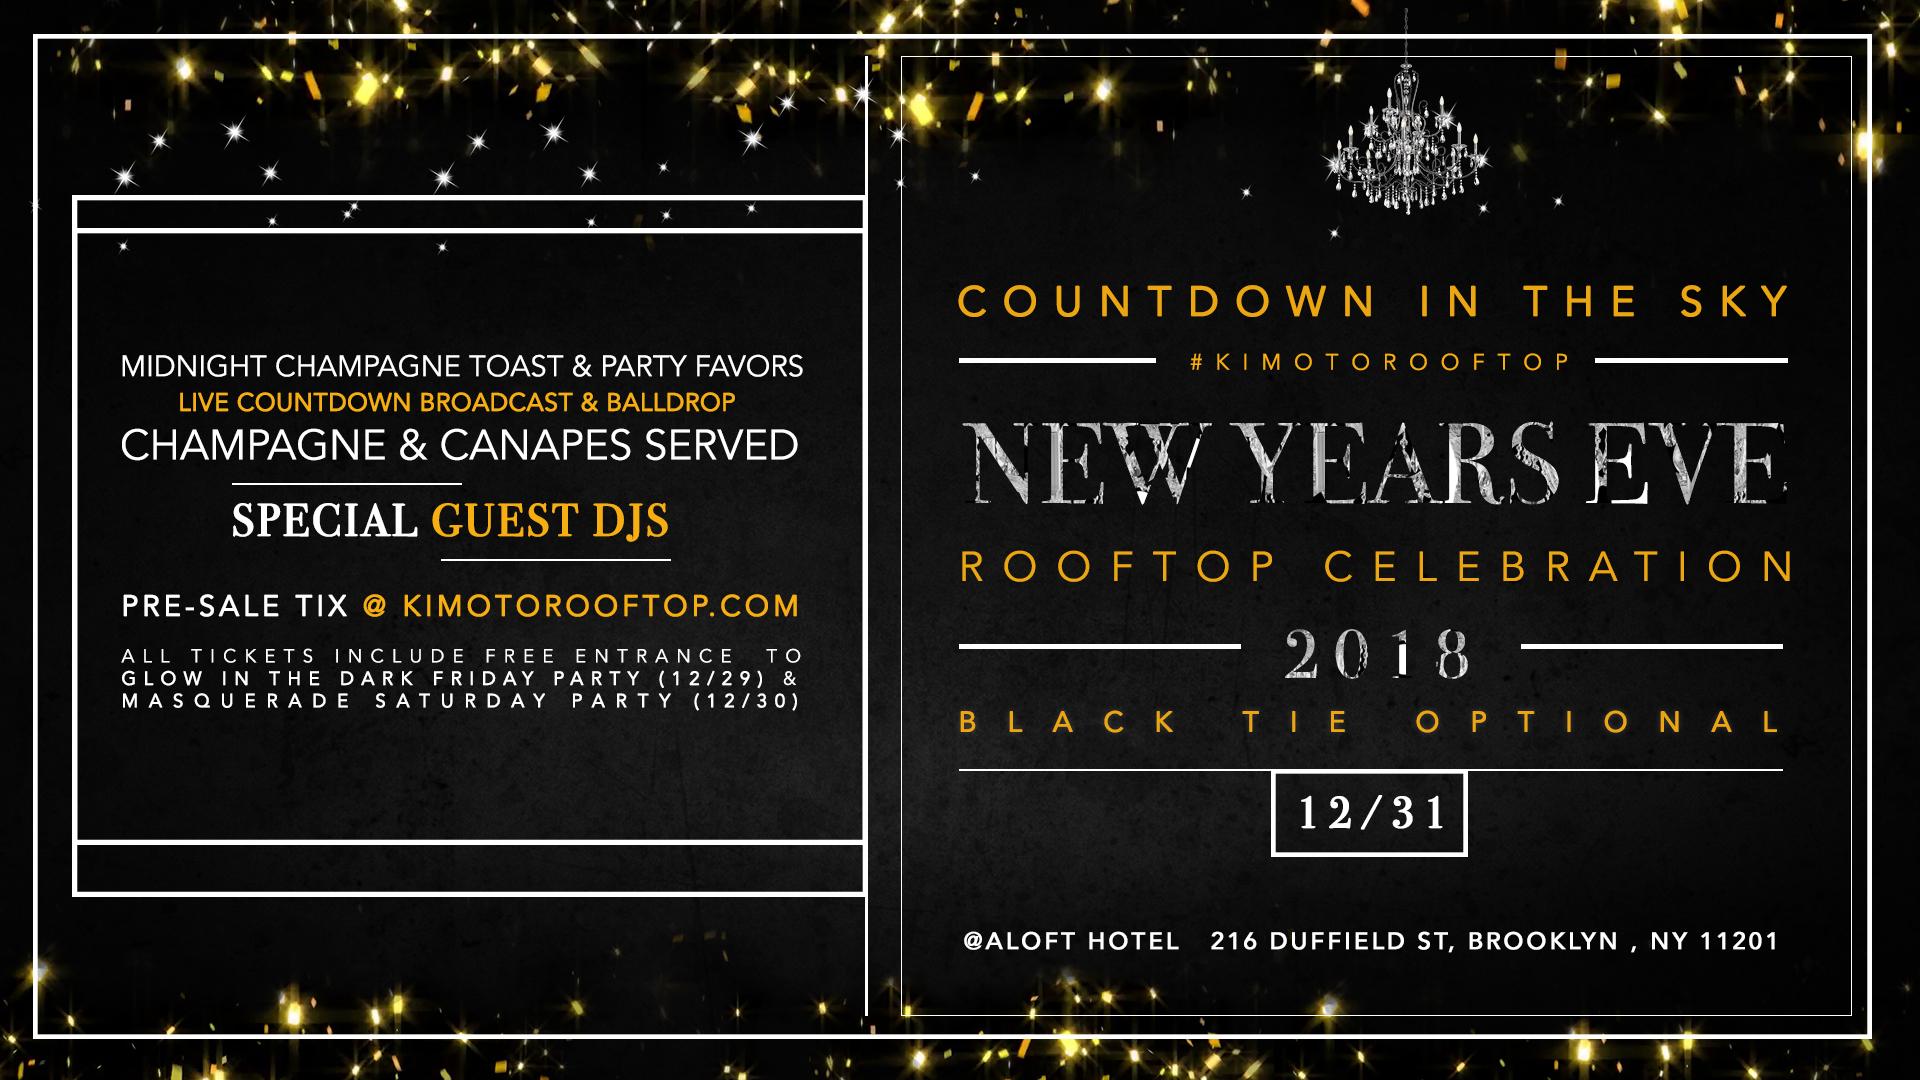 Countdown in the Sky - Aloft & Sheraton Hotel Brooklyn